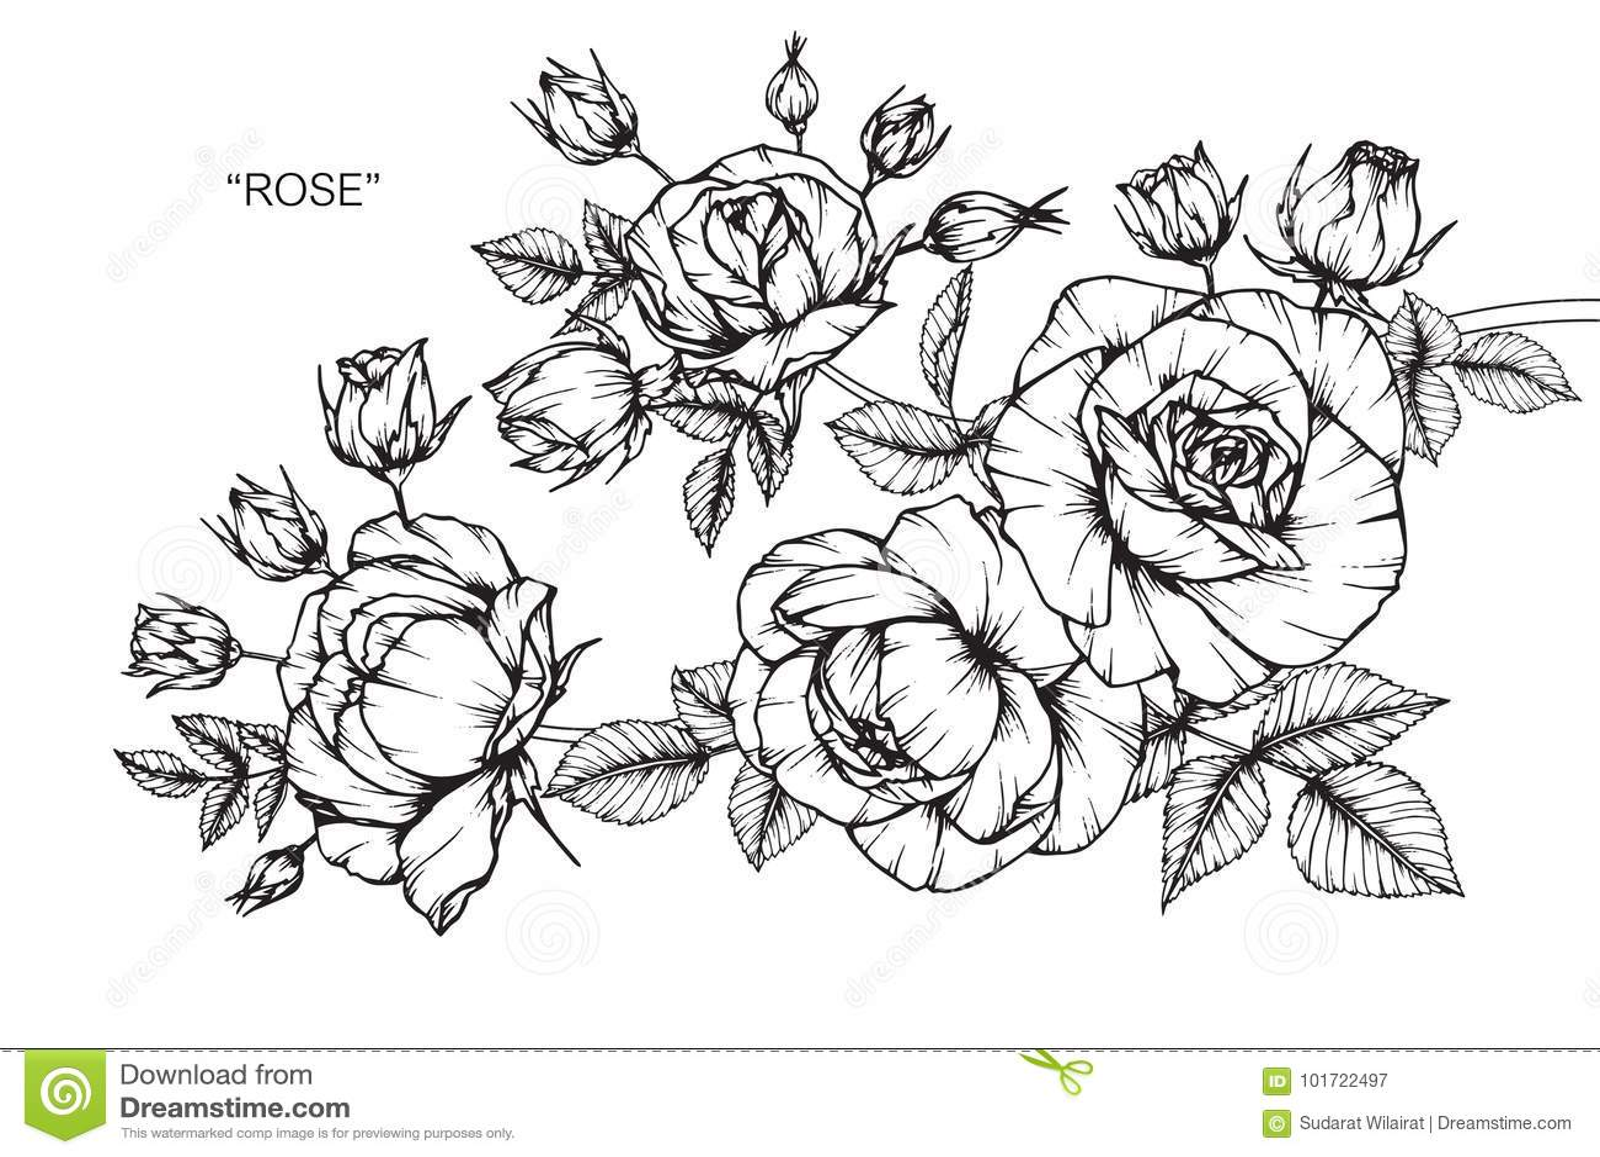 dessin et croquis de fleur de rose illustration stock illustration du monochrome roses 101722497. Black Bedroom Furniture Sets. Home Design Ideas